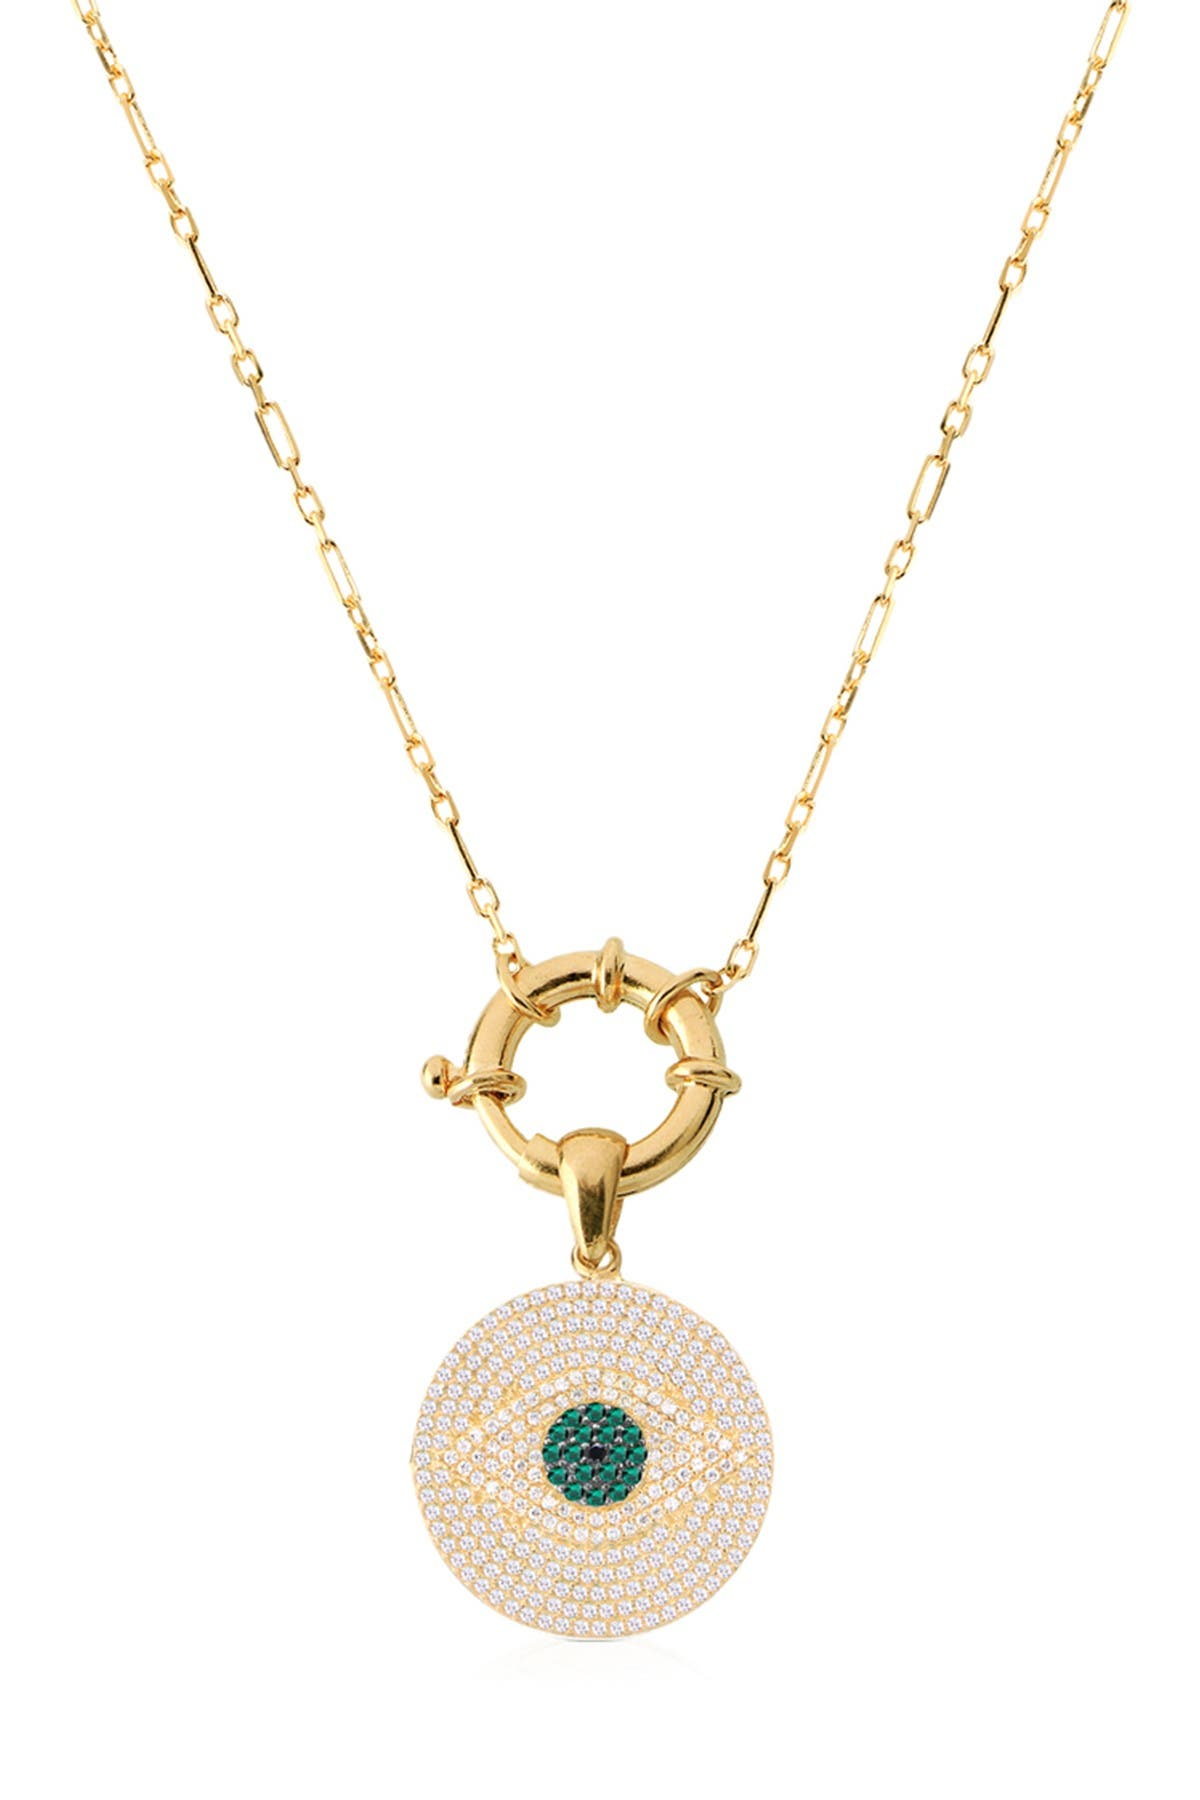 Image of Gabi Rielle 14K Yellow Gold Vermeil Pave Evil Eye Disc Pendant Necklace